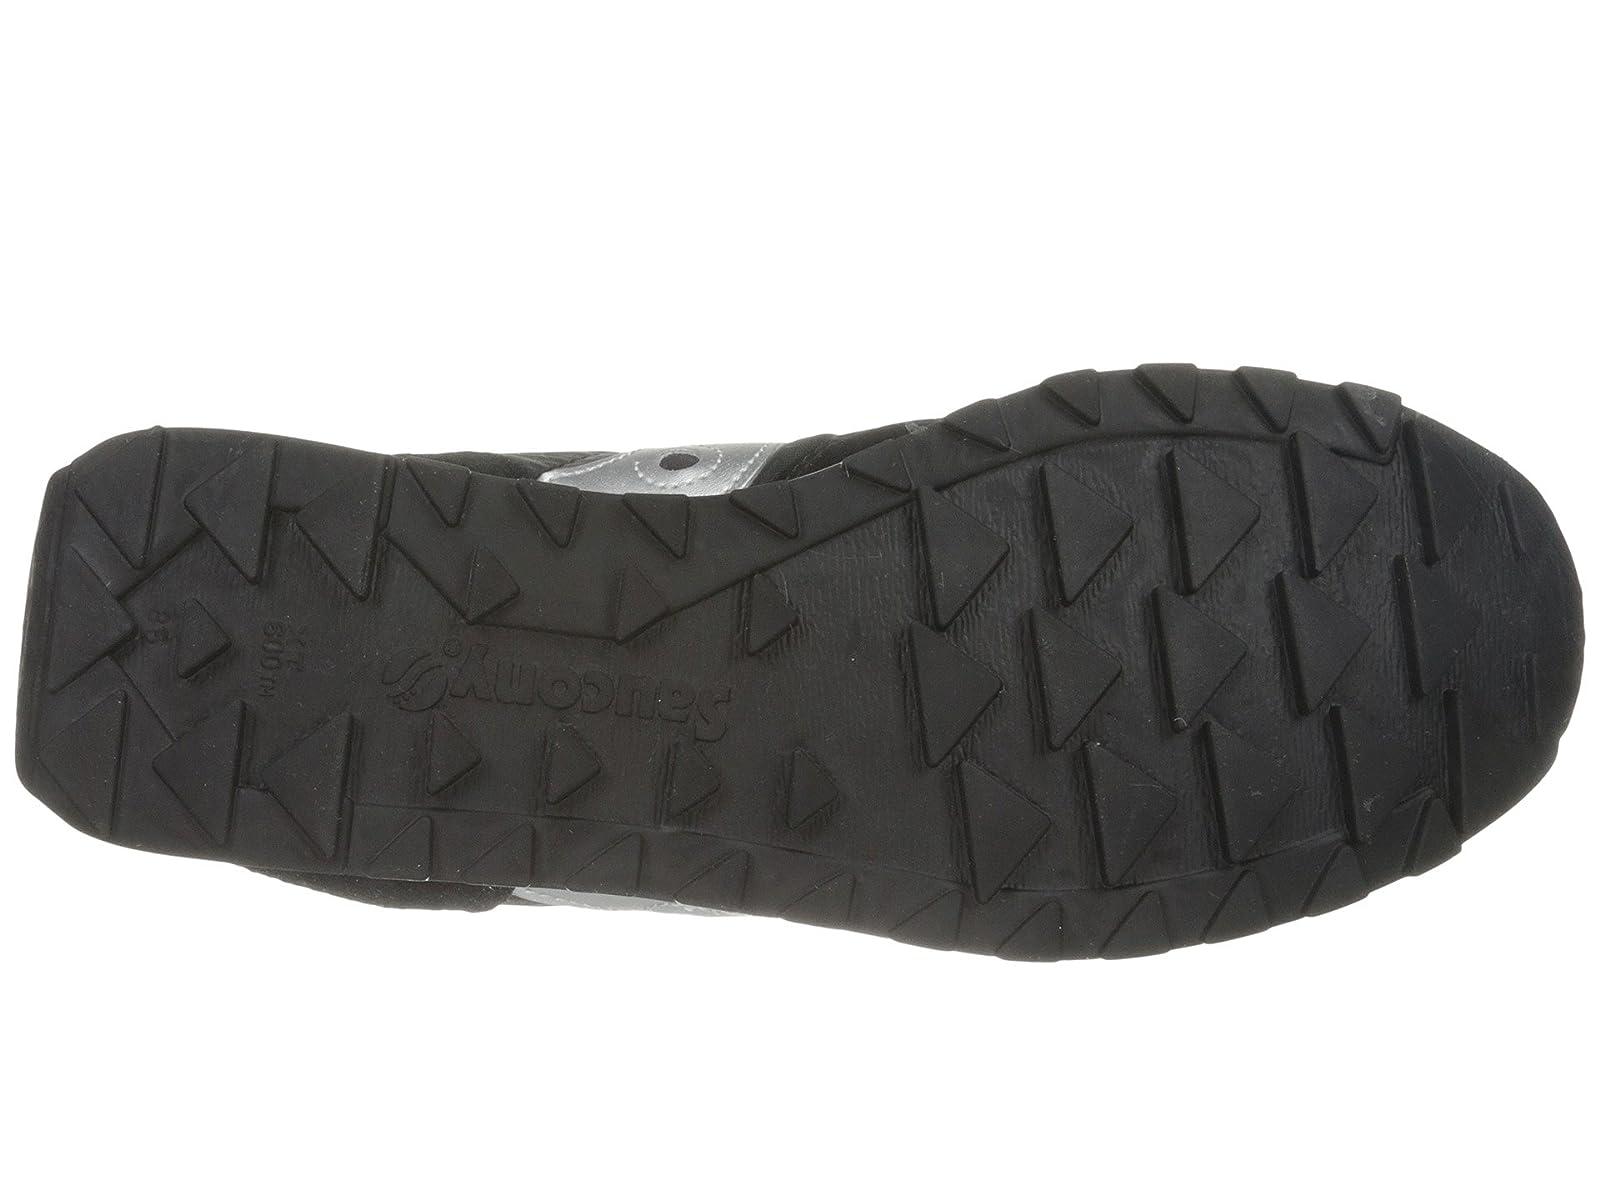 Woman-039-s-Sneakers-amp-Athletic-Shoes-Saucony-Originals-Jazz-Original thumbnail 4